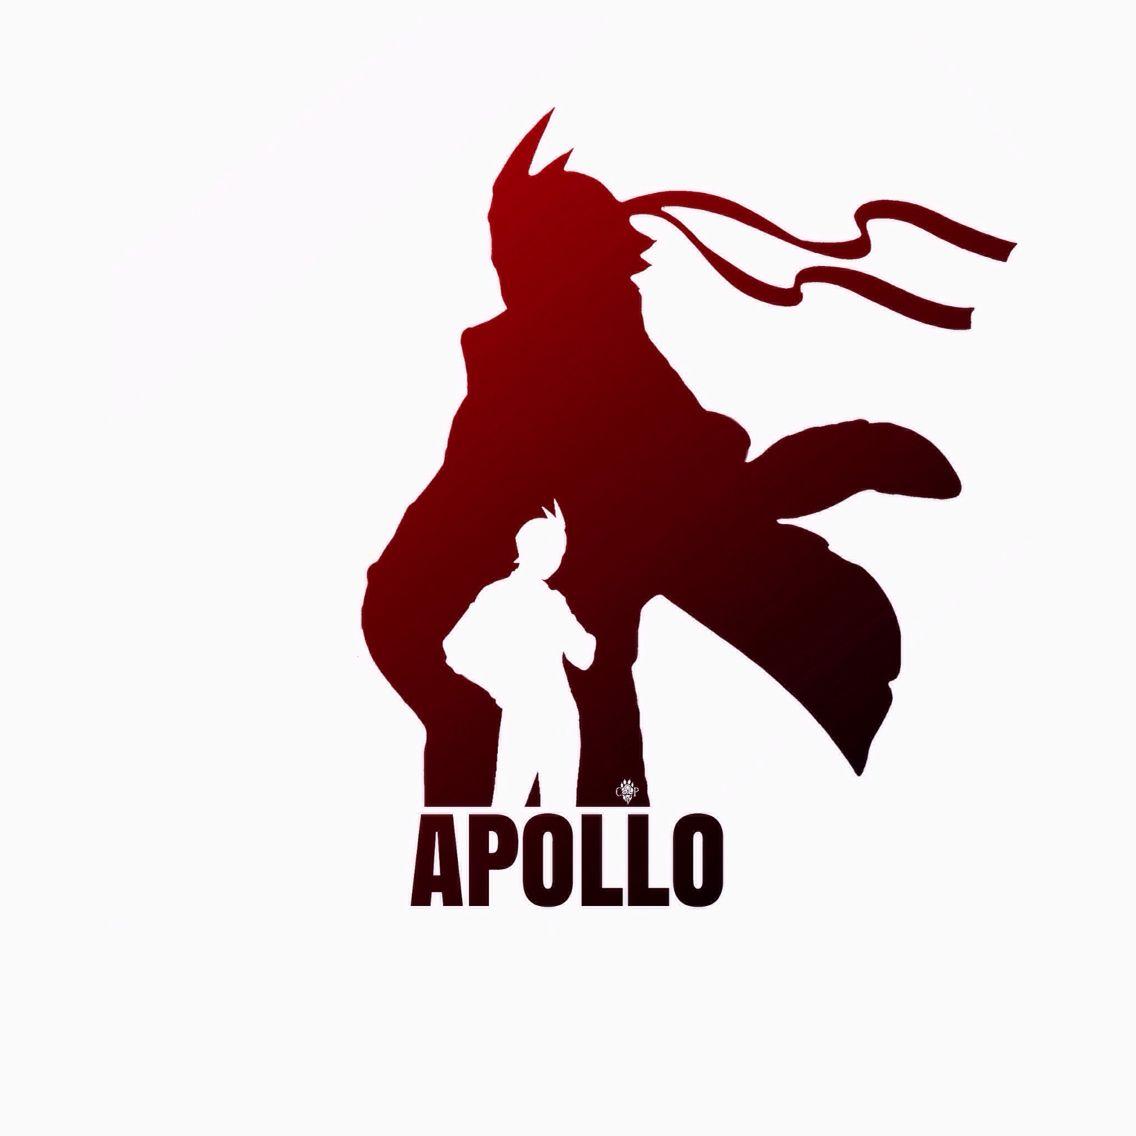 Tags Ace Attorney Apollo Justice Apollo Justice Phoenix Wright Anime Games Minimalist Lockscreen Apollo Justice Phoenix Wright Mario Kart Characters